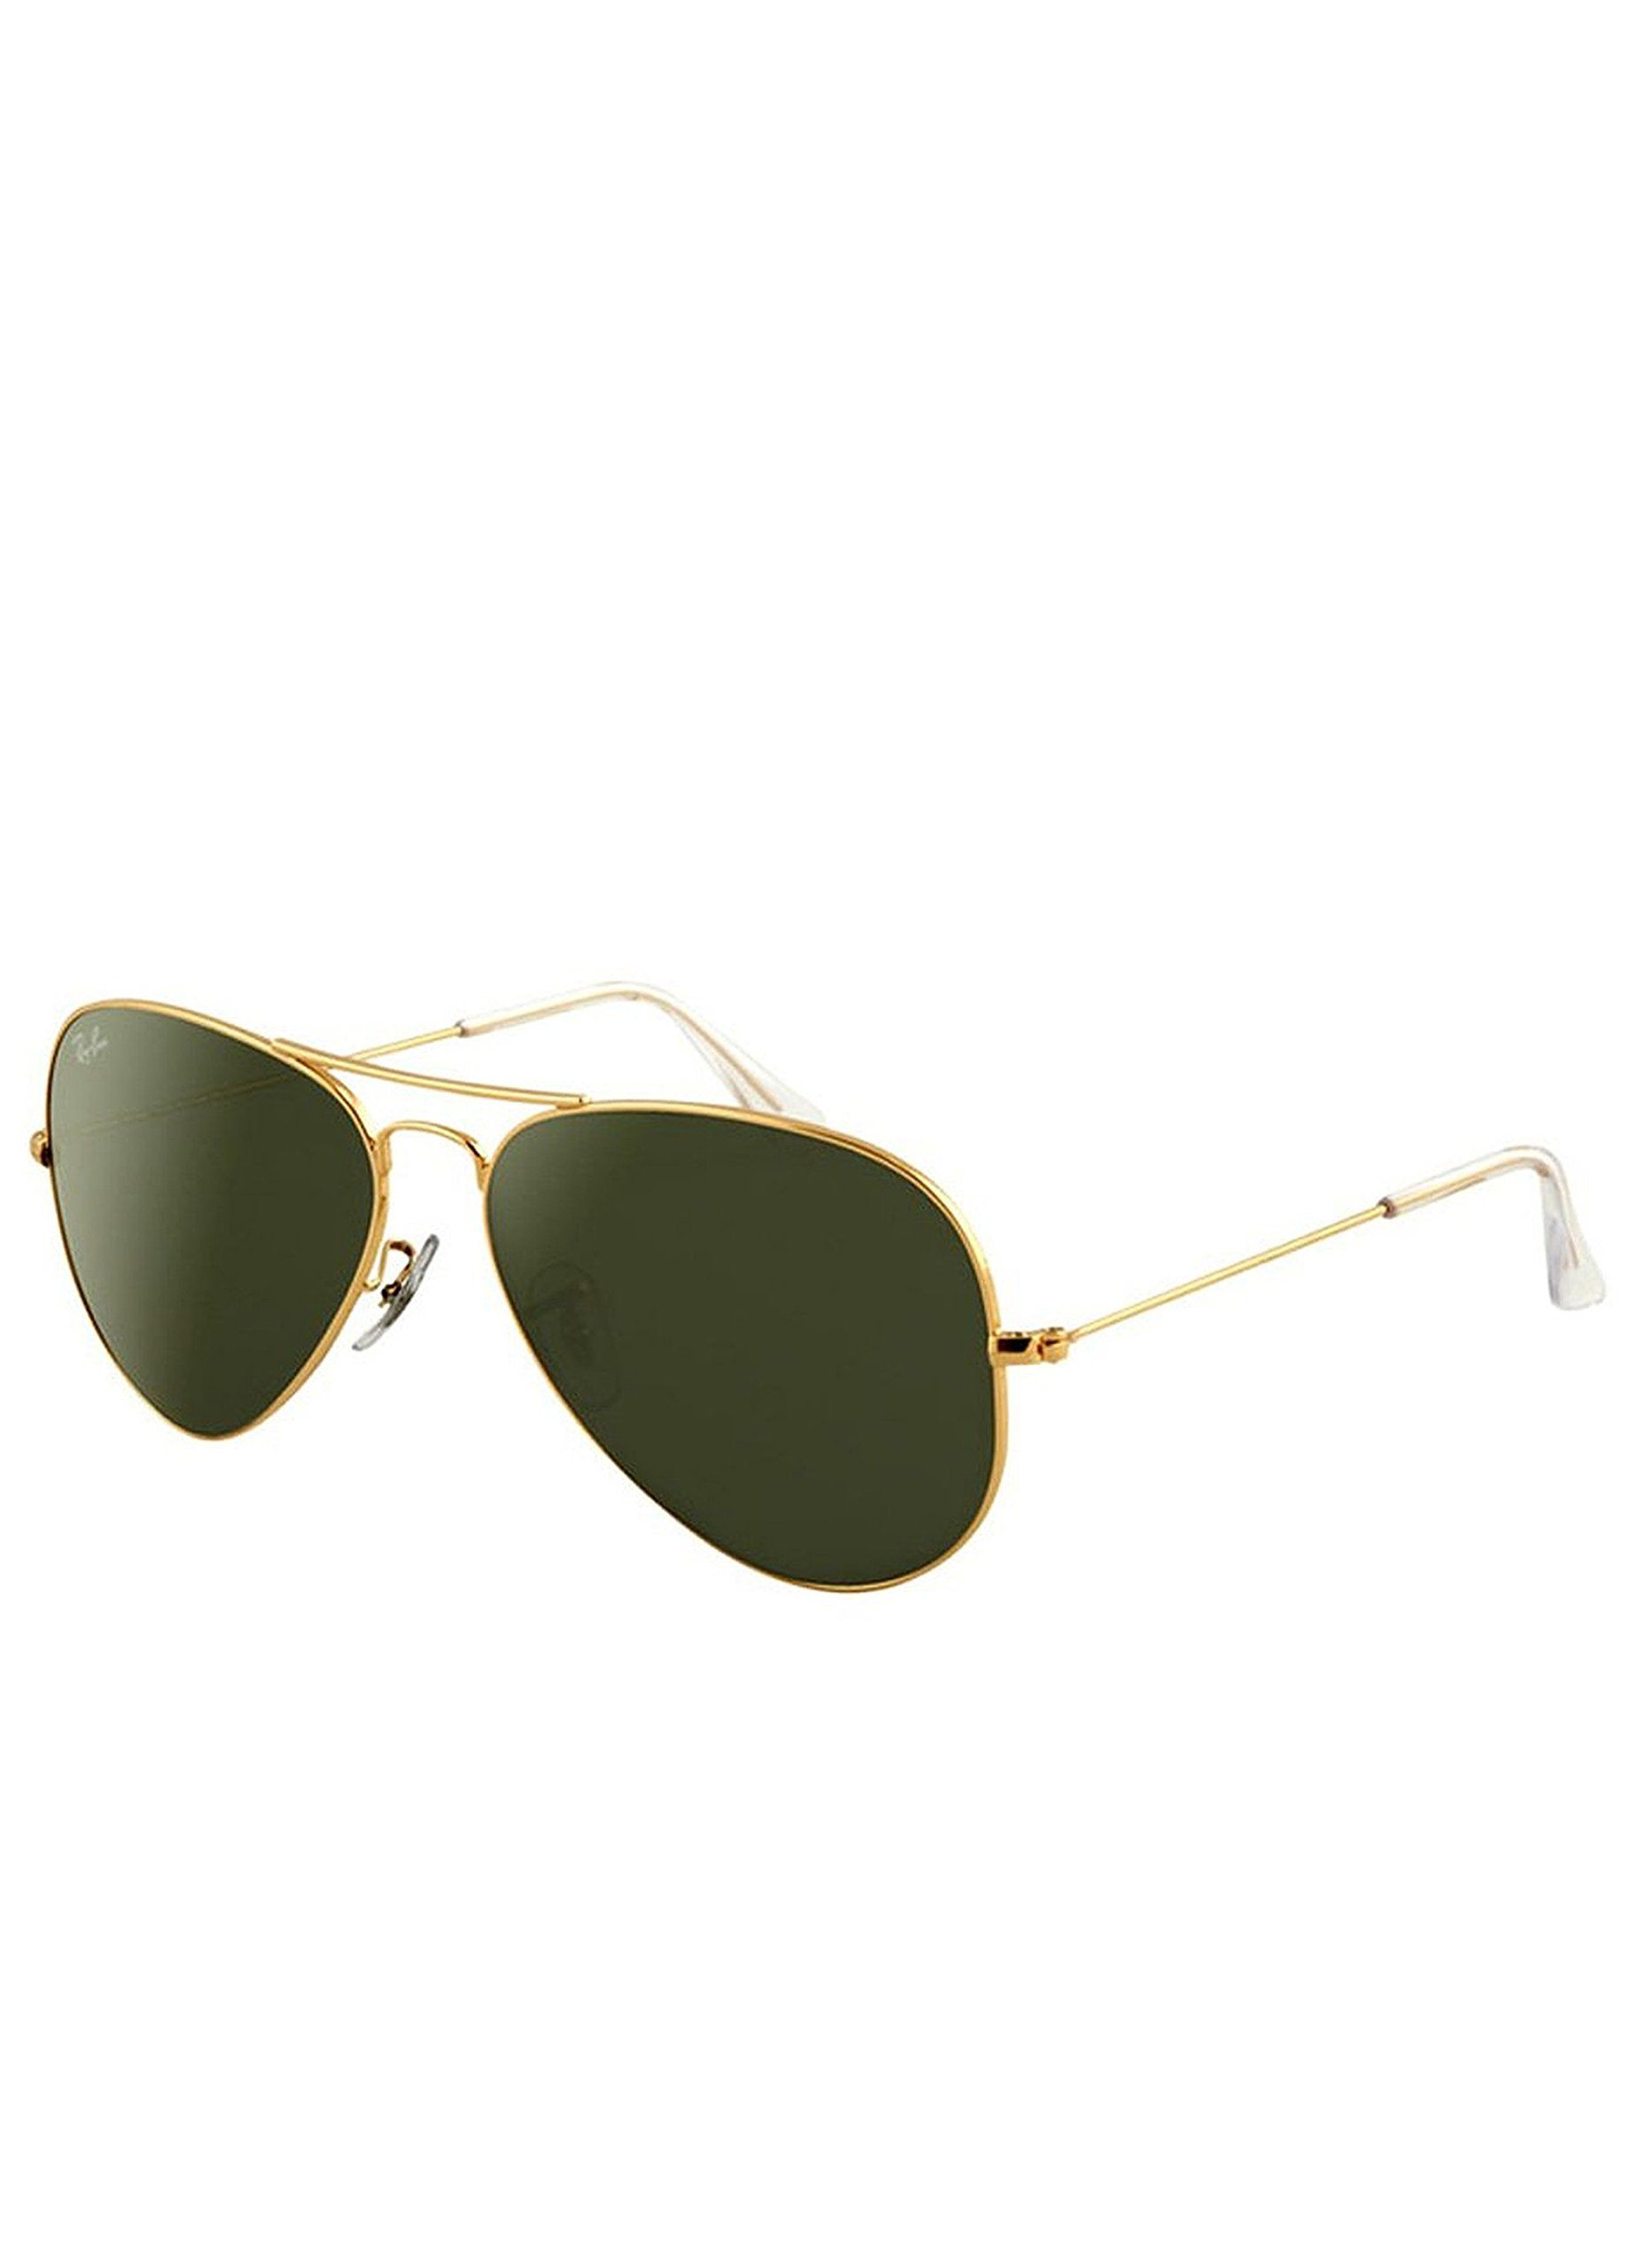 ray ban aviator 3025 gold frame green lens